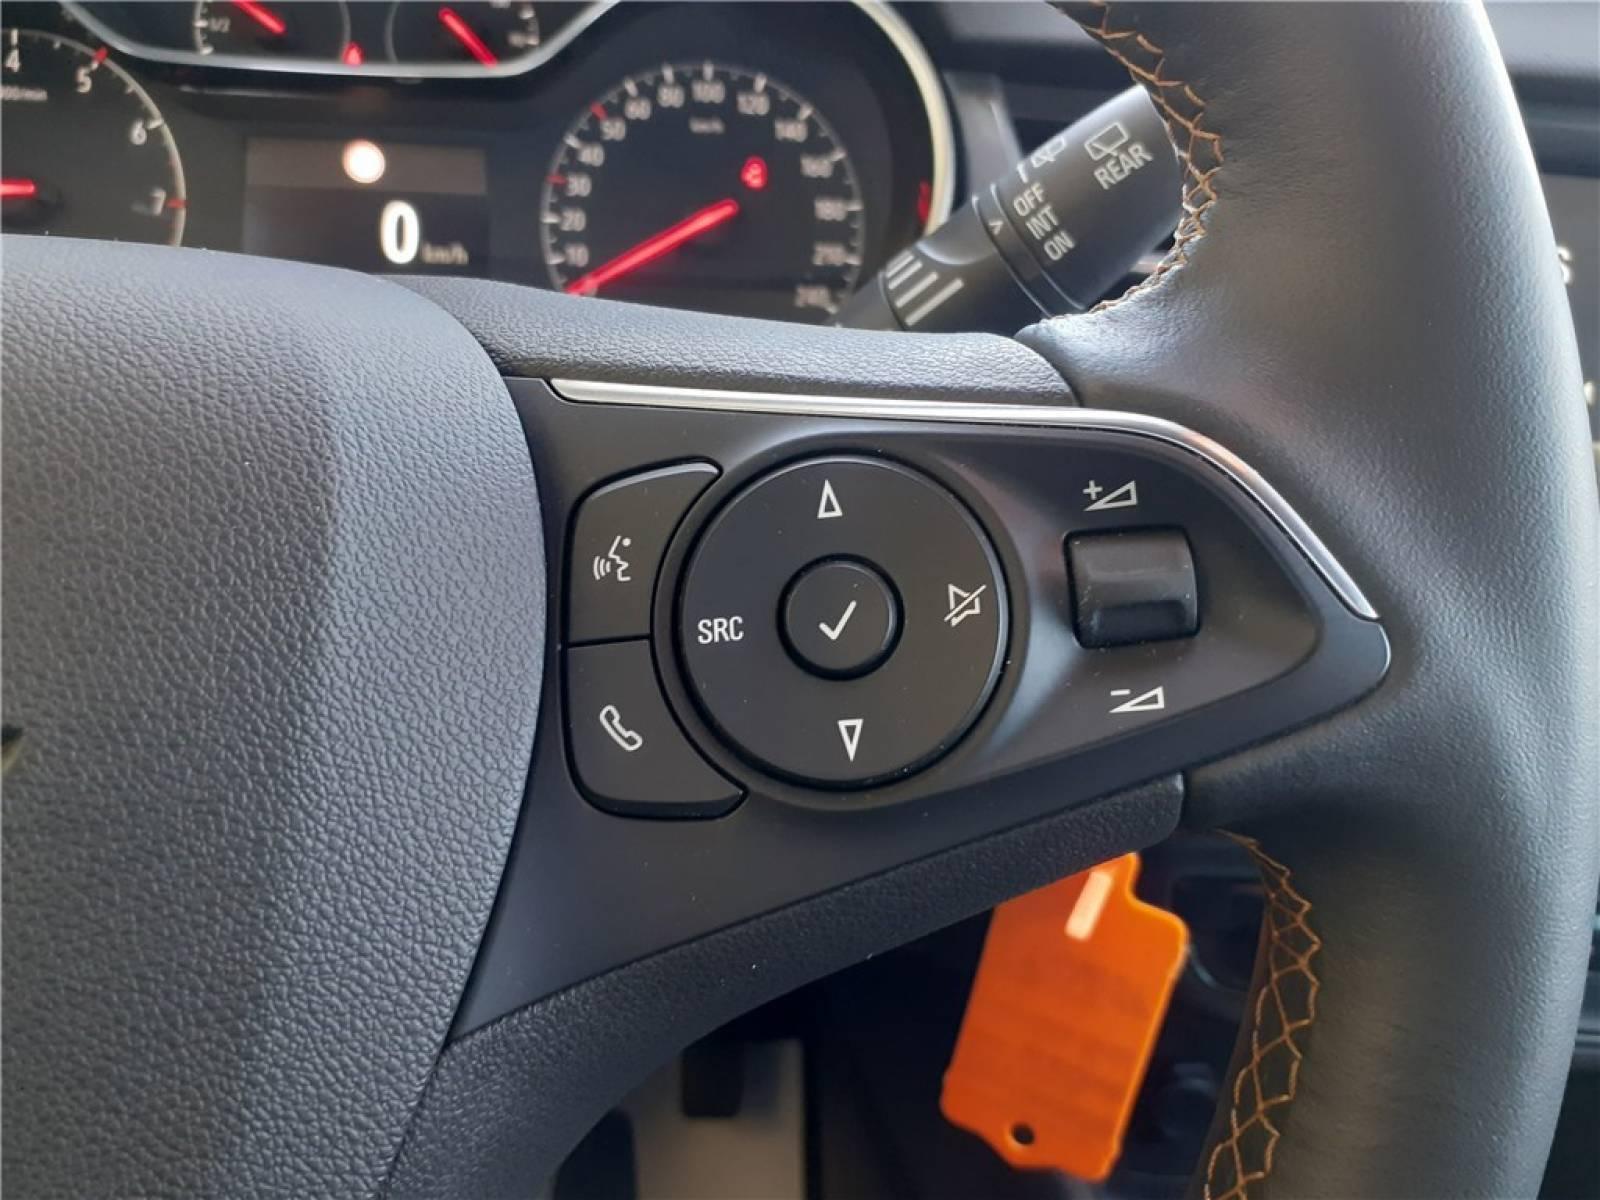 OPEL Crossland X 1.2 Turbo 110 ch - véhicule d'occasion - Groupe Guillet - Opel Magicauto - Chalon-sur-Saône - 71380 - Saint-Marcel - 19